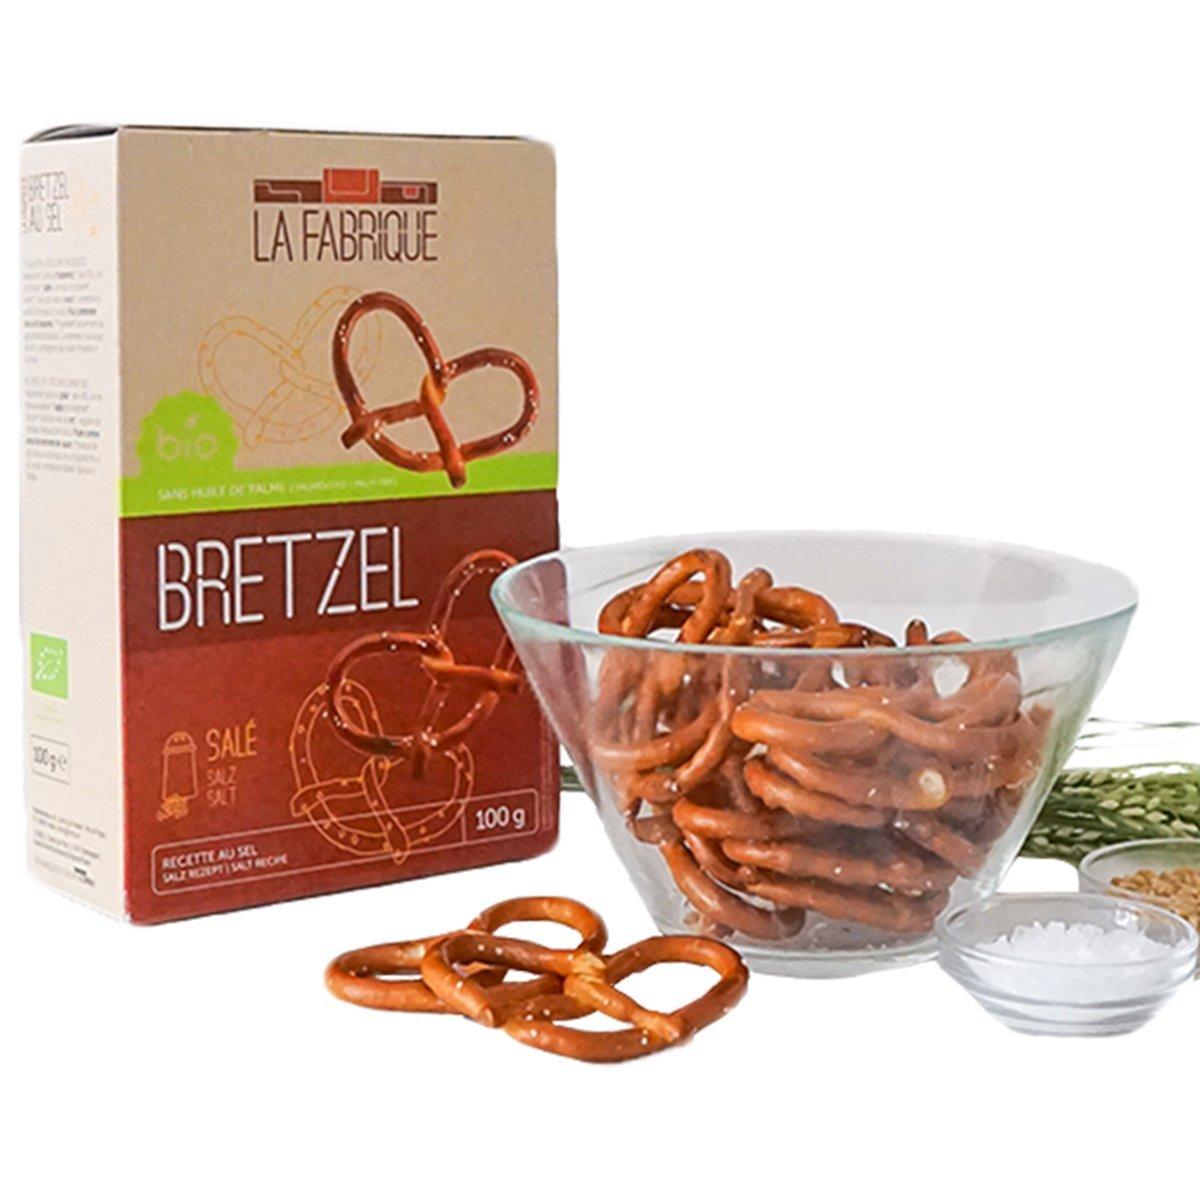 Triple Pack Organic Hard Pretzel, Pretzel Crisps, Pretzel Thins - Best before date: 01.02.2021